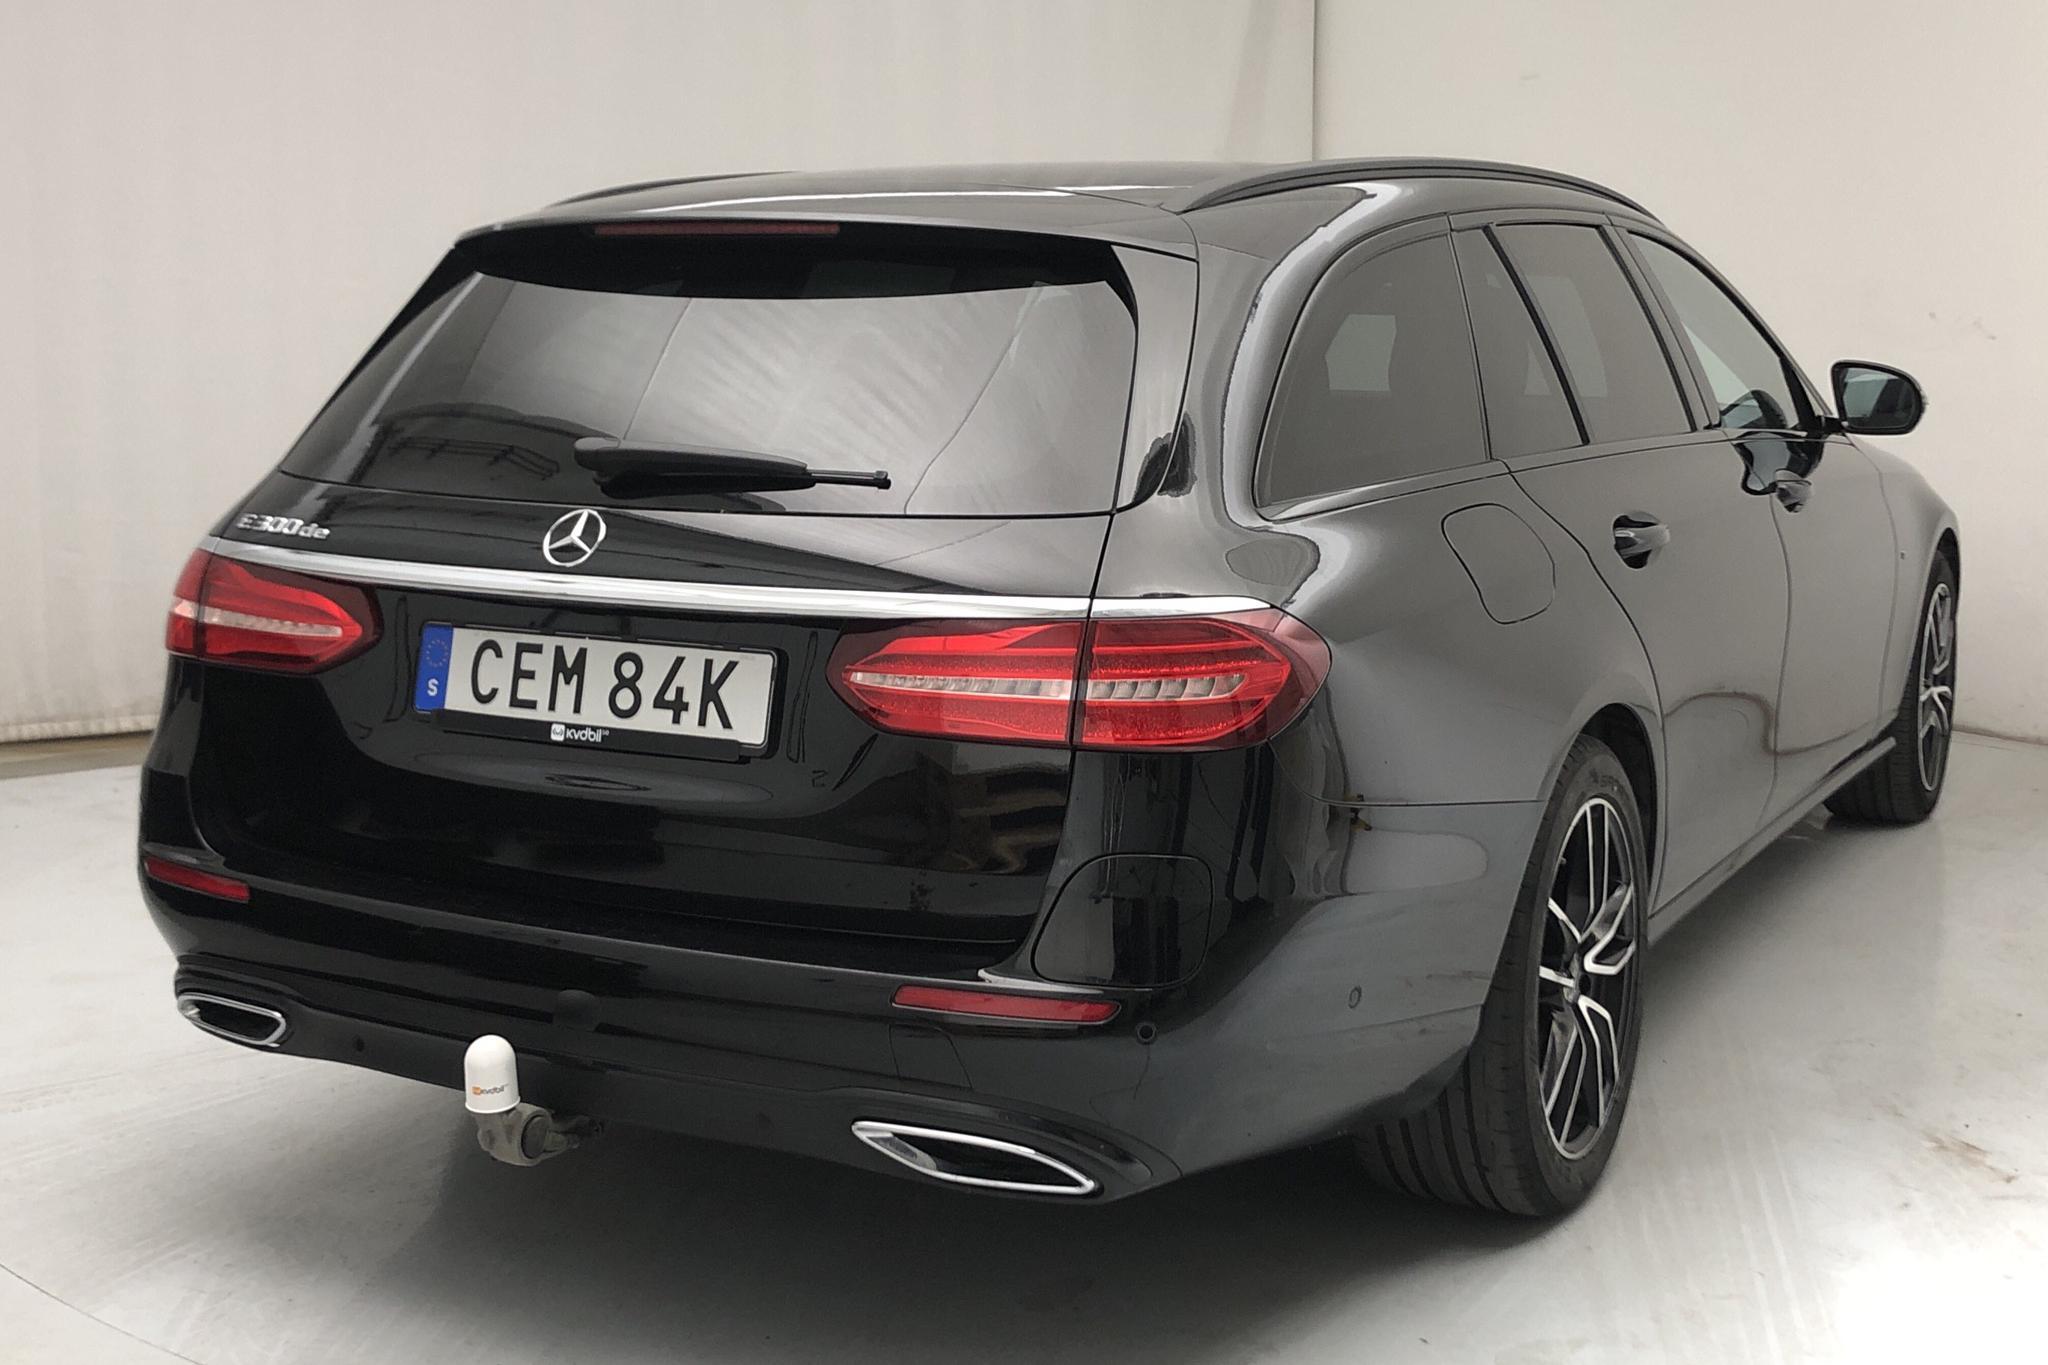 Mercedes E 300 de Kombi S213 (316hk) - 37 760 km - Automatic - black - 2020